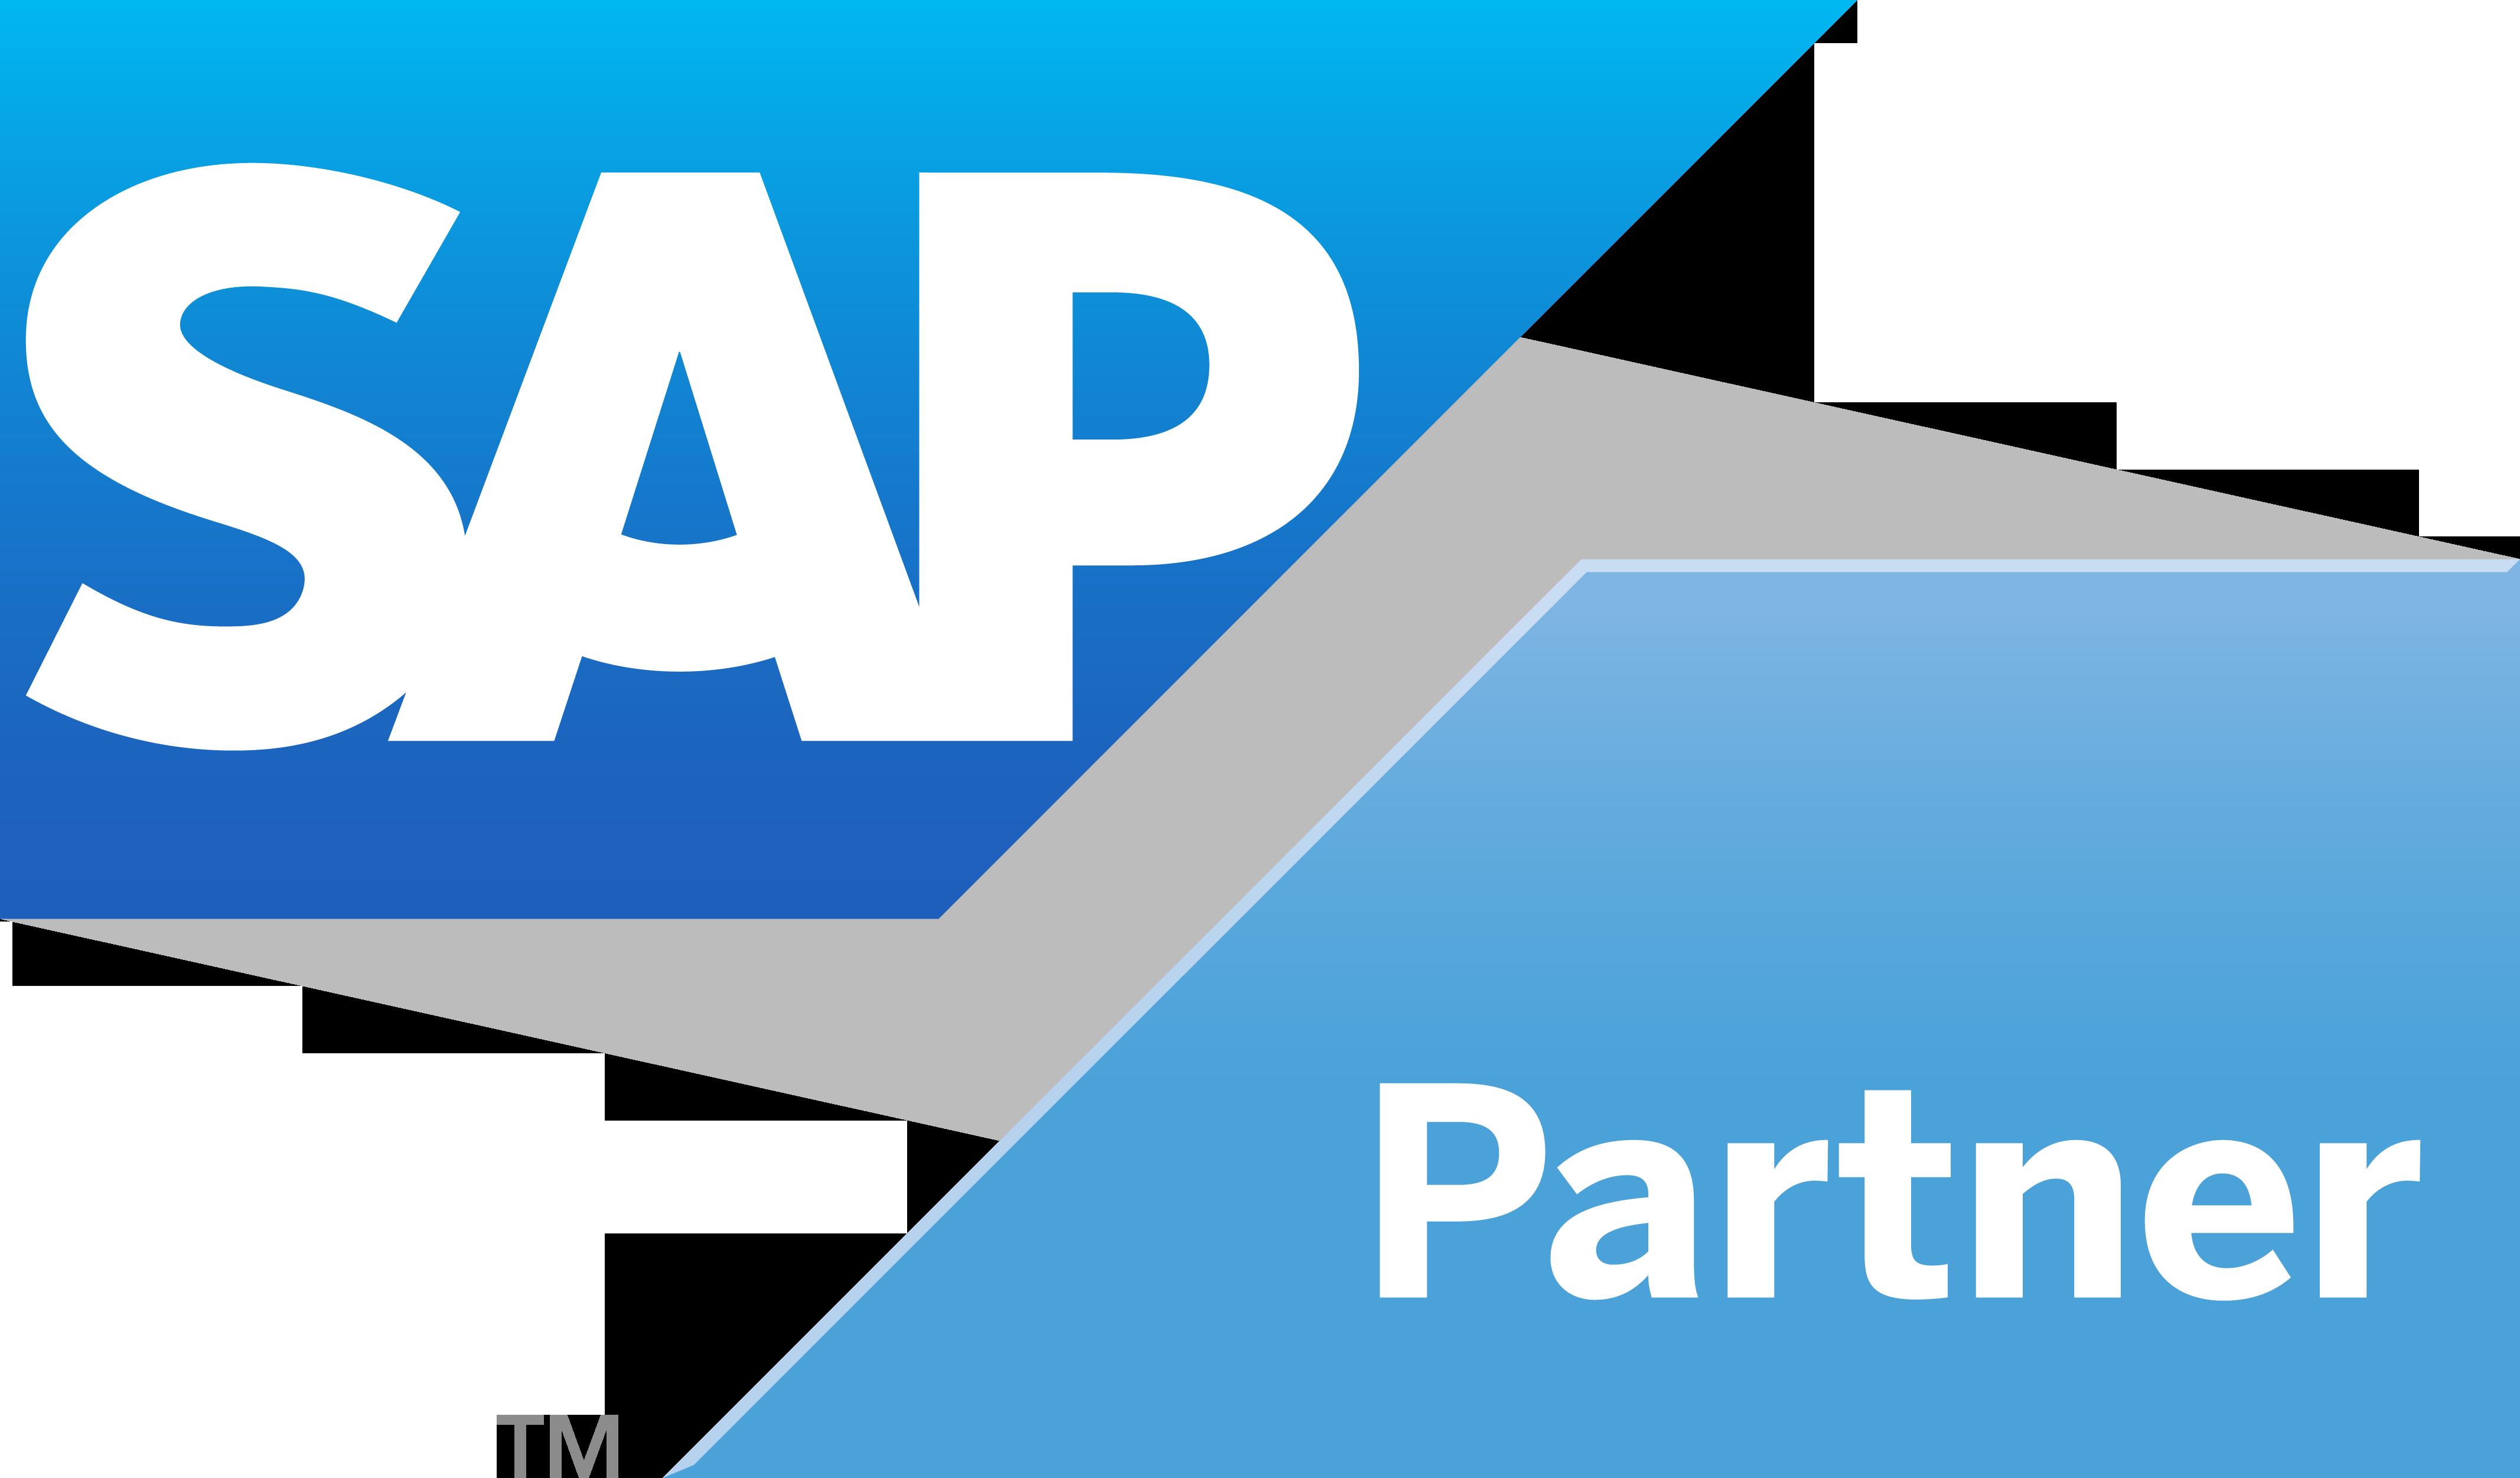 Parceria Iclass S1 SAP IClass One